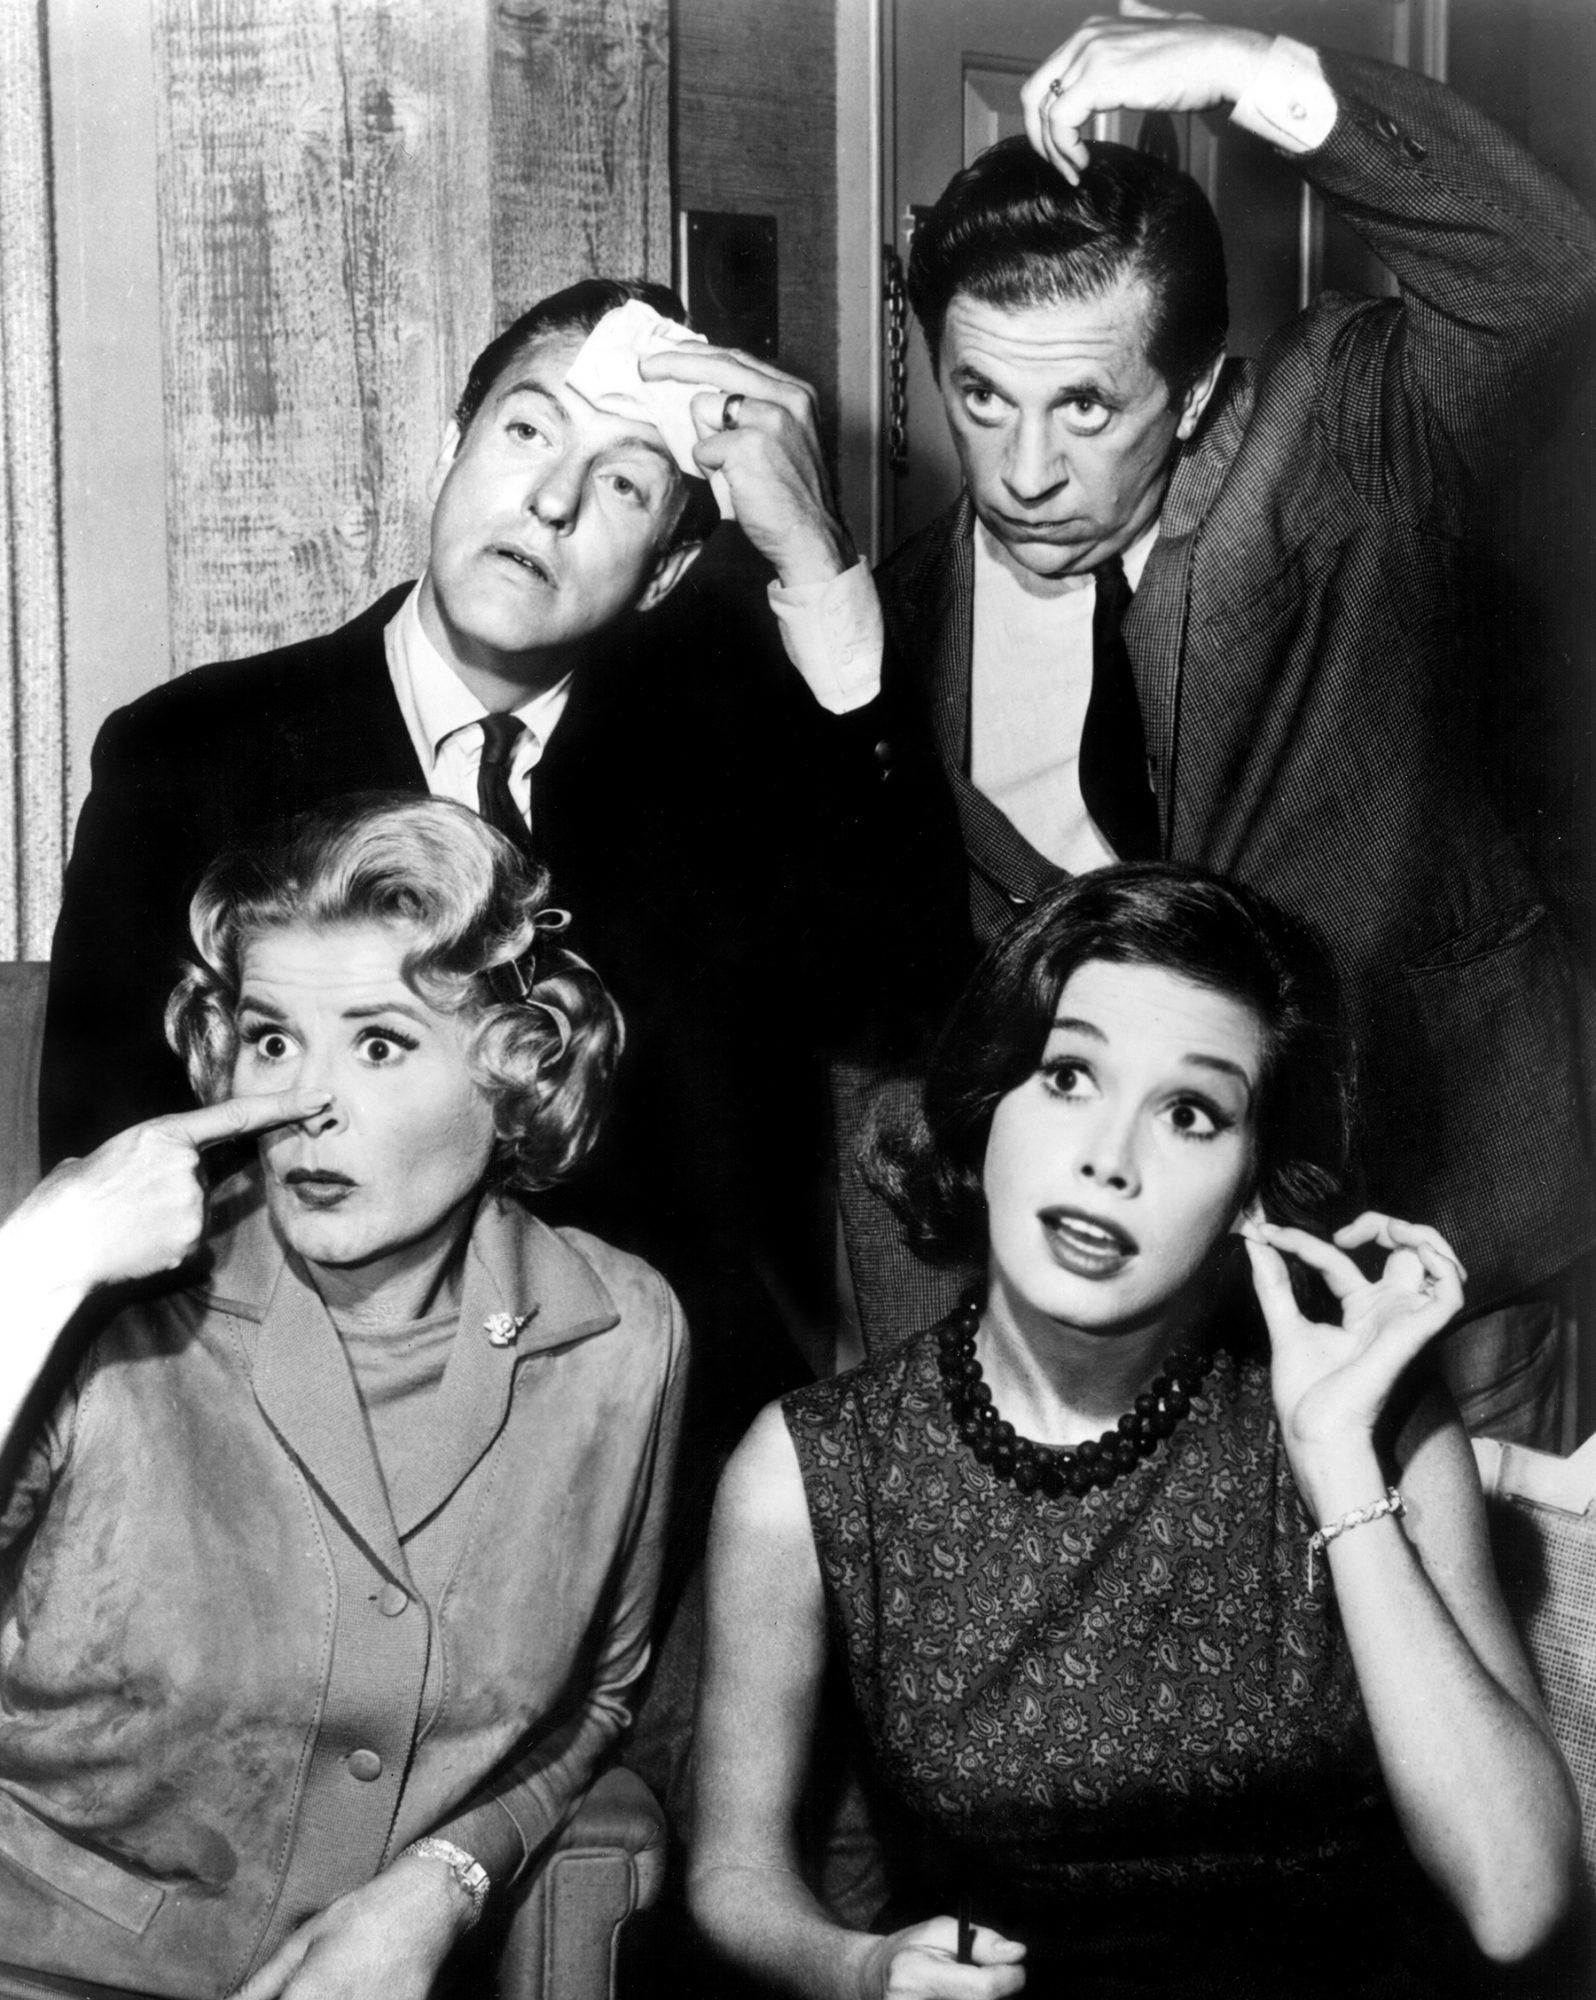 THE DICK VAN DYKE SHOW, (clockwise from top left): Dick Van Dyke, Morey Amsterdam, Mary Tyler Moore,